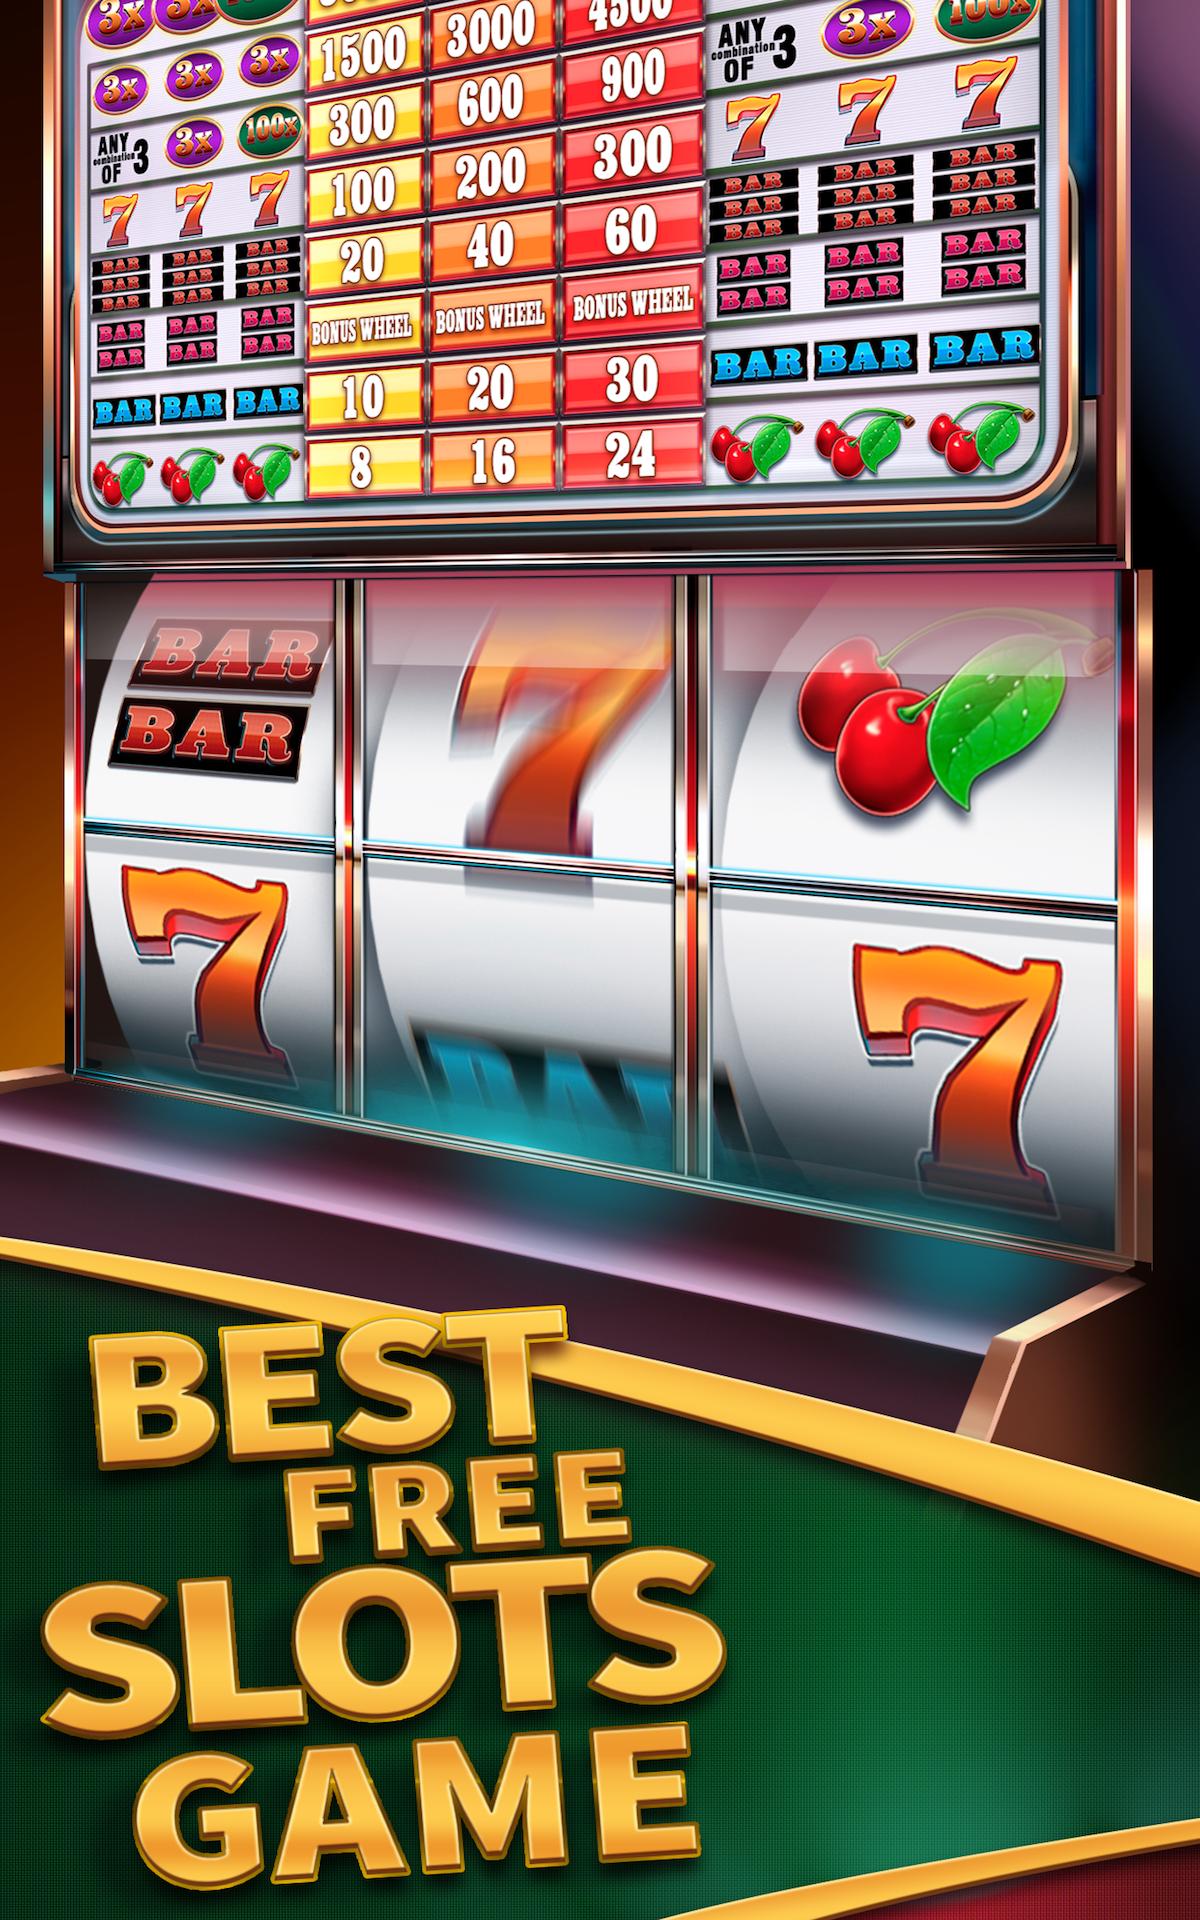 Best slot machine - 98561